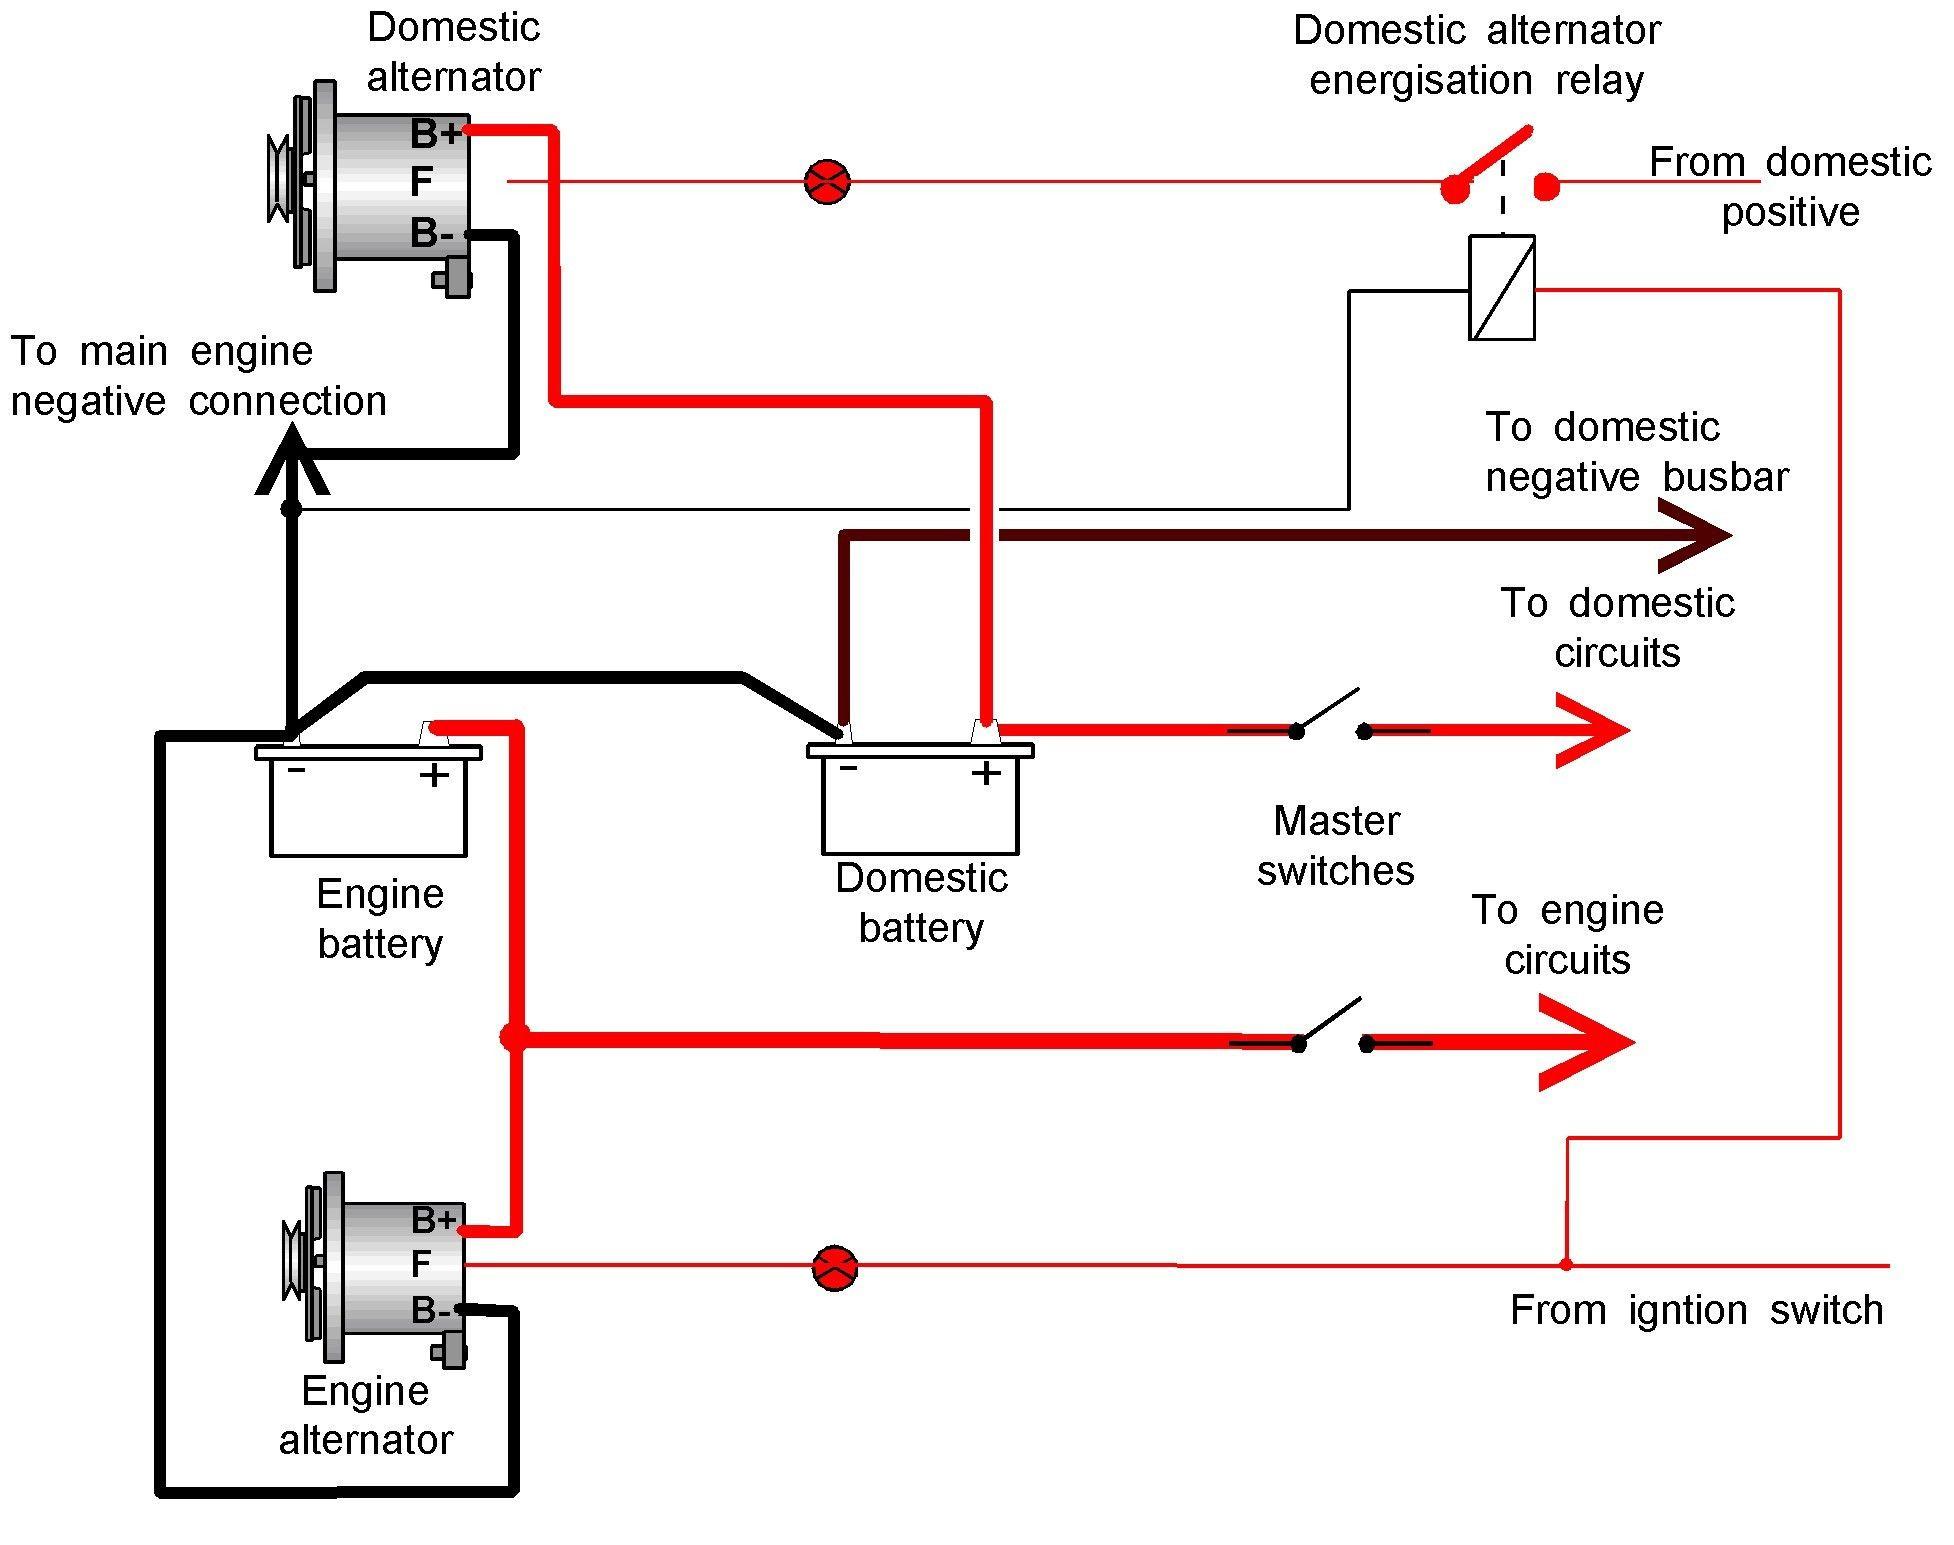 Best Of Vauxhall Alternator Wiring Diagram Diagrams Digramssample Diagramimages Wiringdiagramsample W Electrical Circuit Diagram Car Alternator Alternator